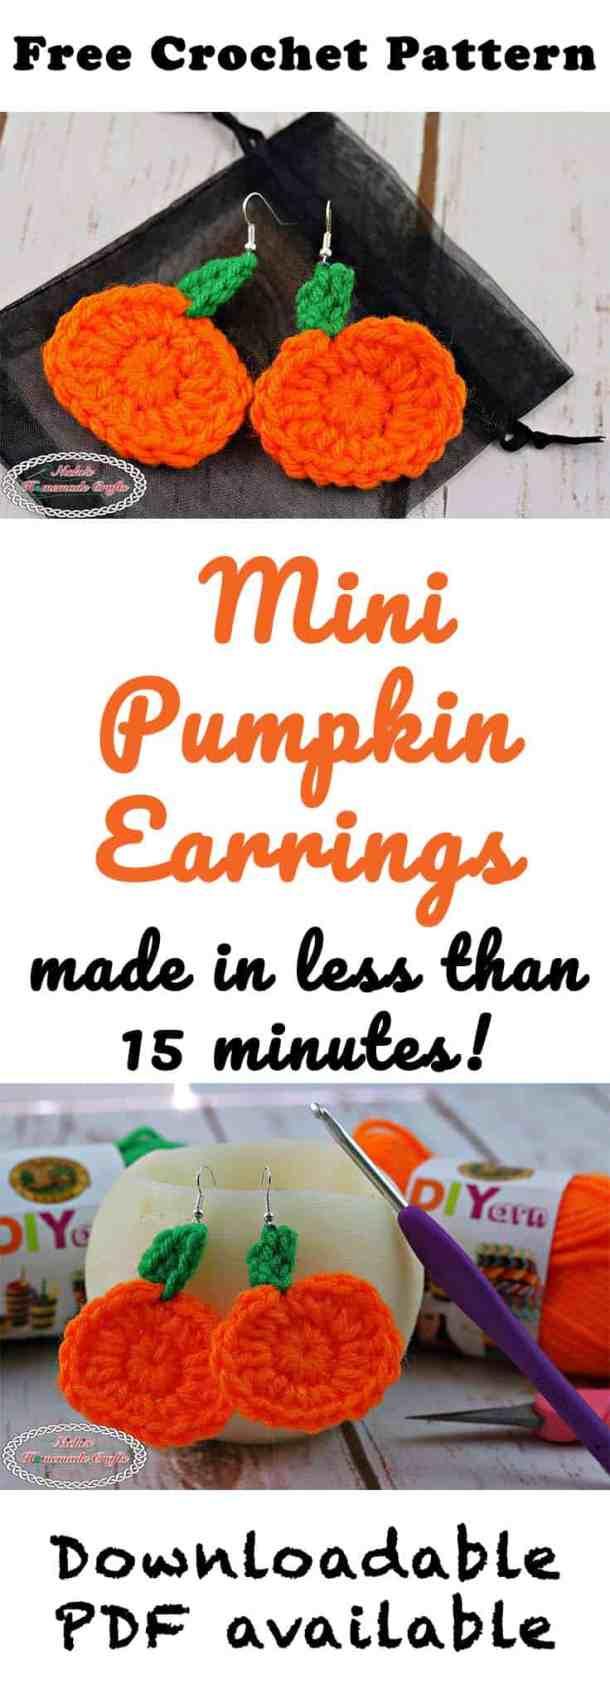 Mini Pumpkin Earrings - Free Crochet Pattern by Nicki's Homemade Crafts #halloween #pumpkin #freecrochetpattern #crochet #earrings